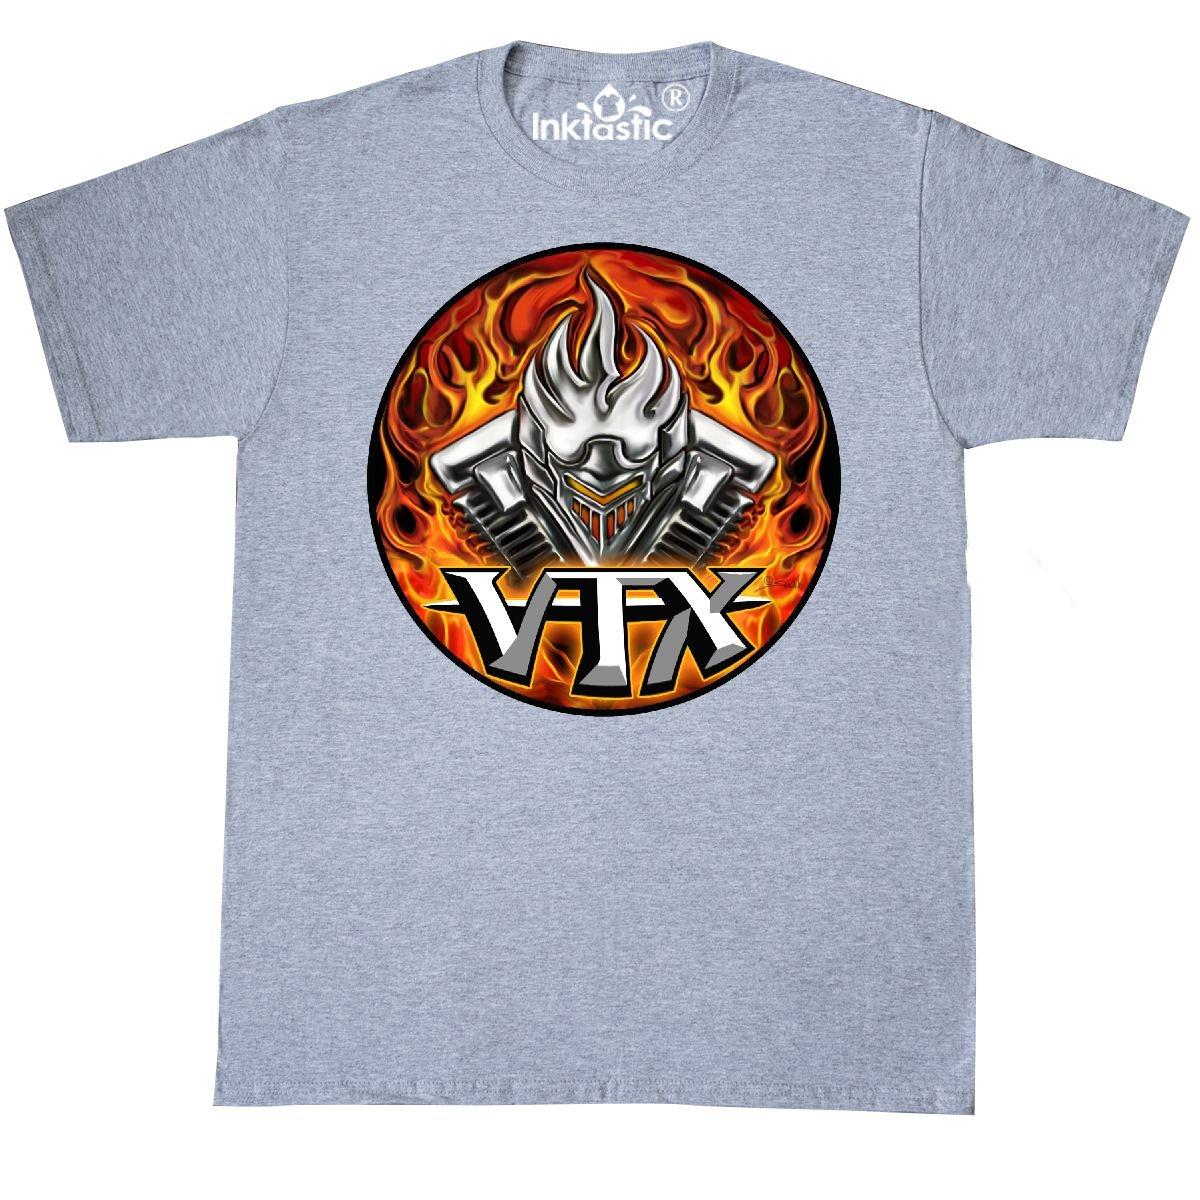 71POzDaoMWL._UL1200_ amazon com inktastic vtx flaming motor t shirt wickedapparel  at soozxer.org